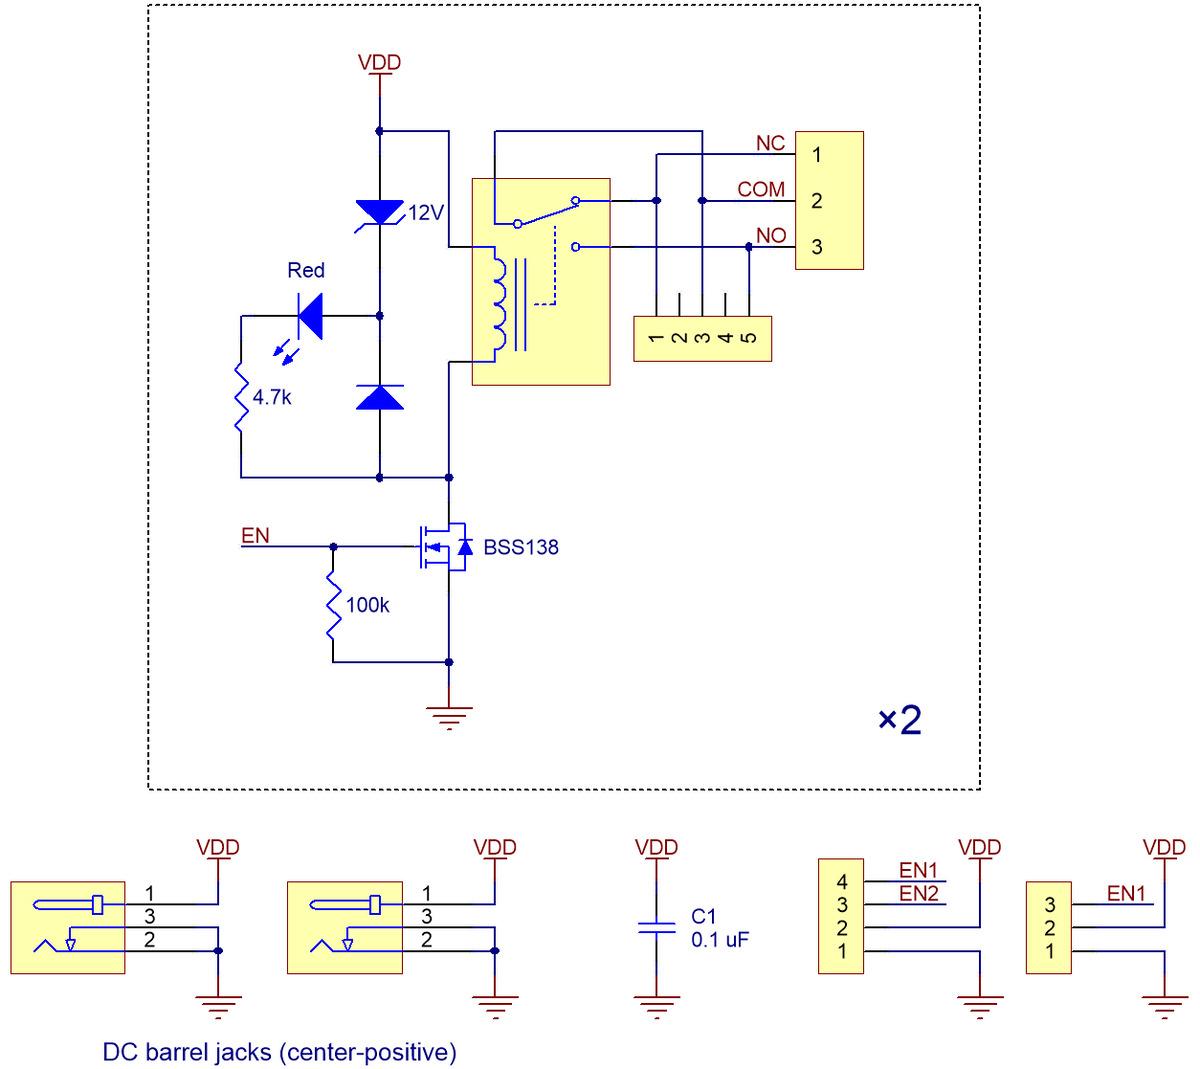 Ansul R 102 Wiring Diagram Game Controller Wiring Diagram